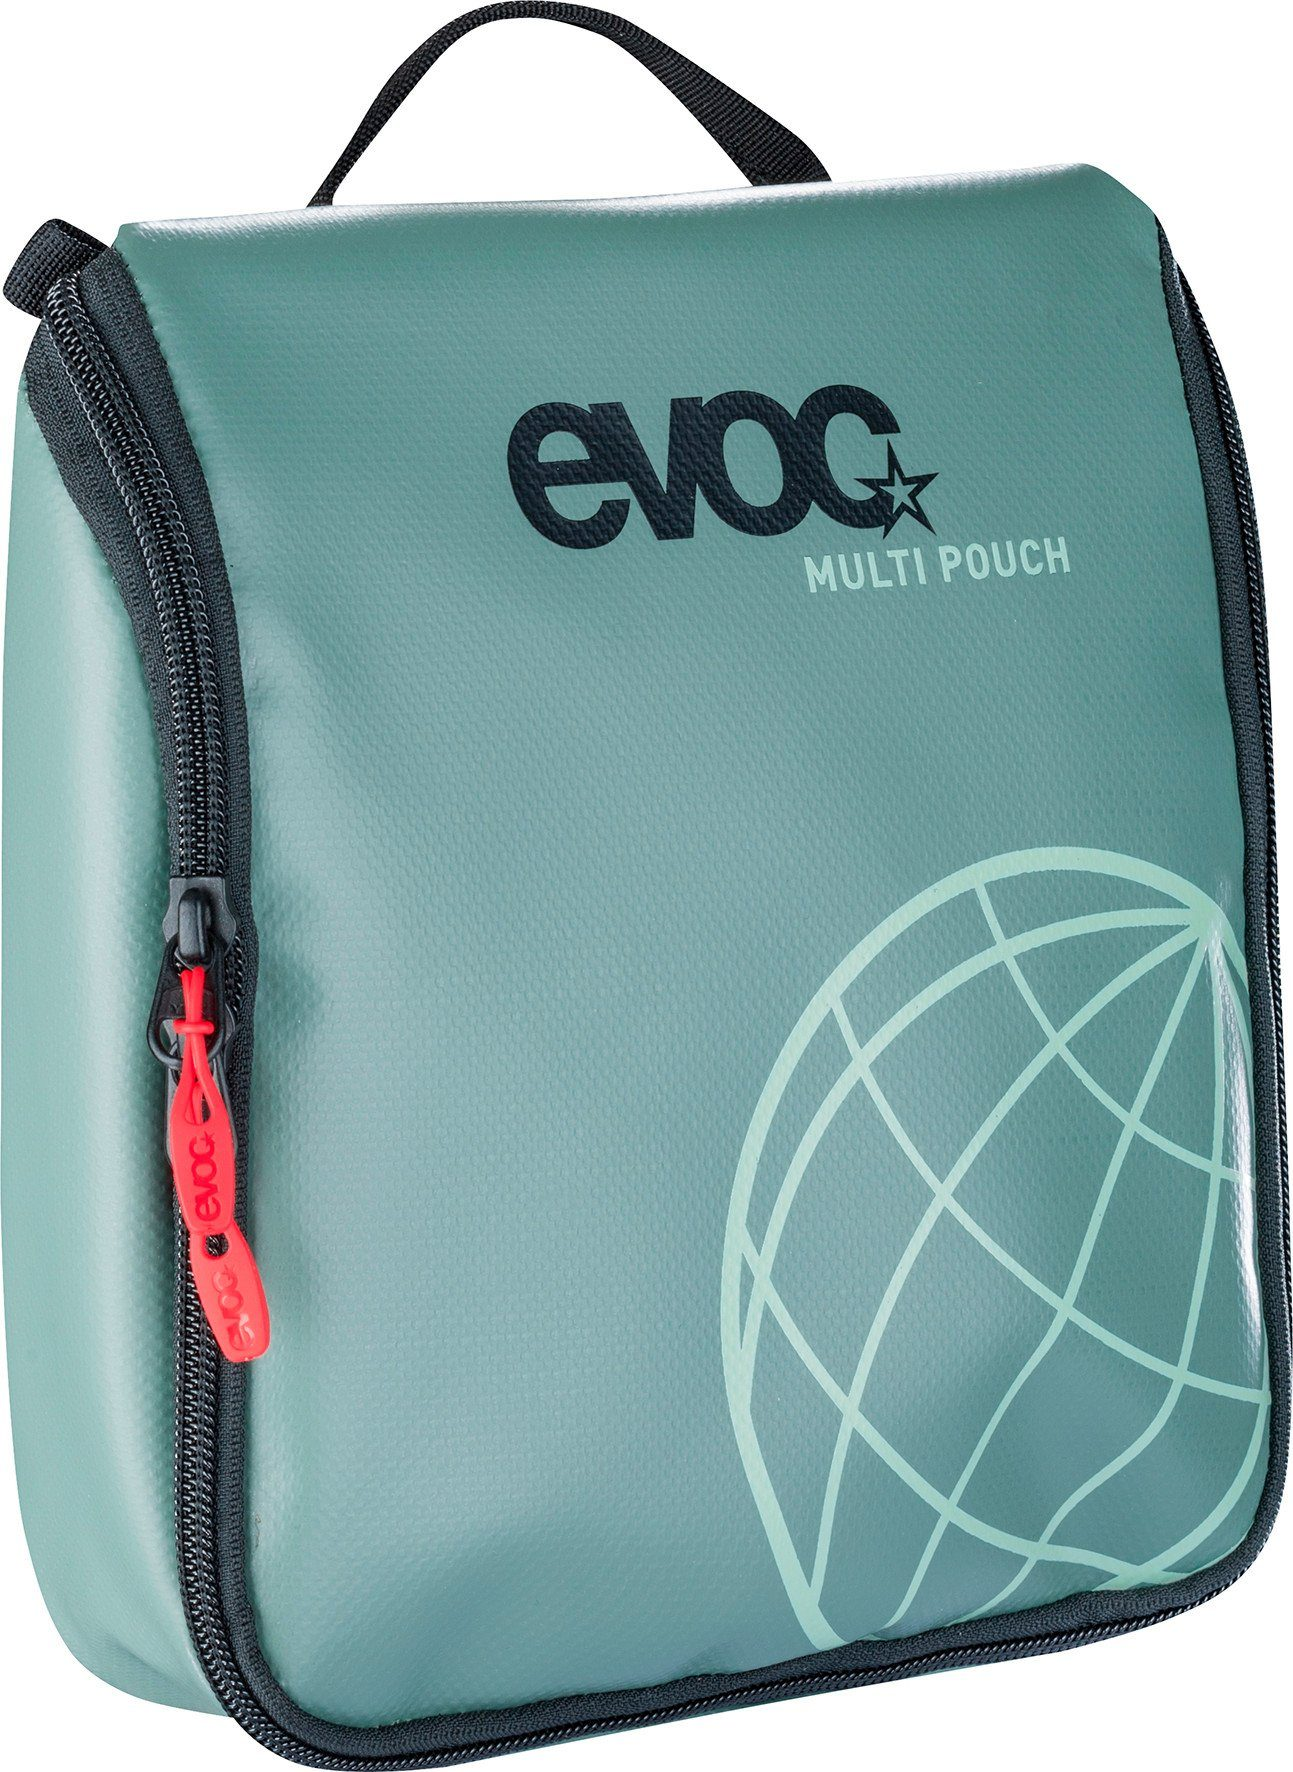 EVOC Fahrradtasche »Multi Pouch«